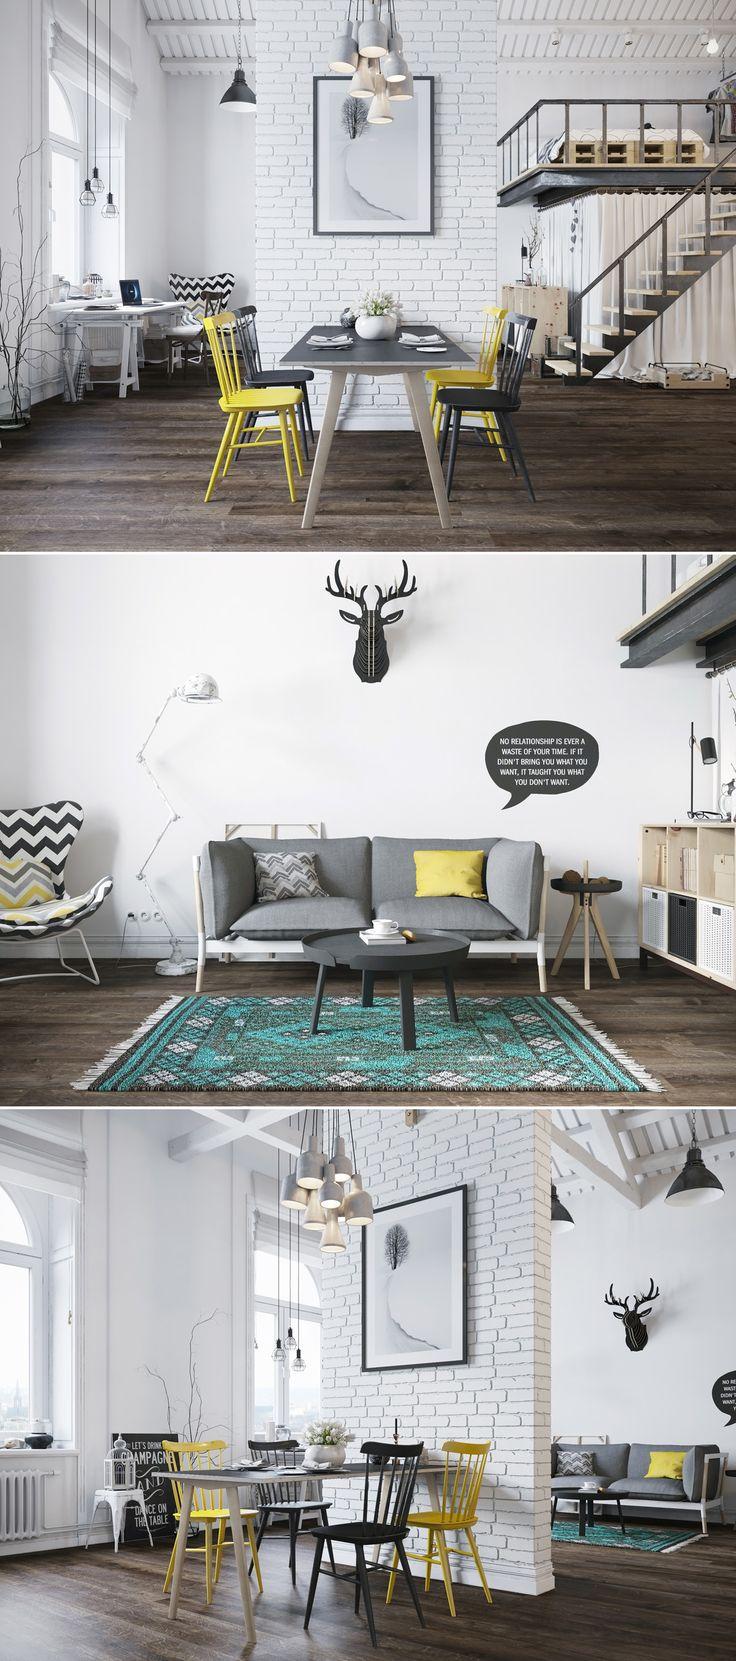 Scandinavian Loft - Галерея 3ddd.ru